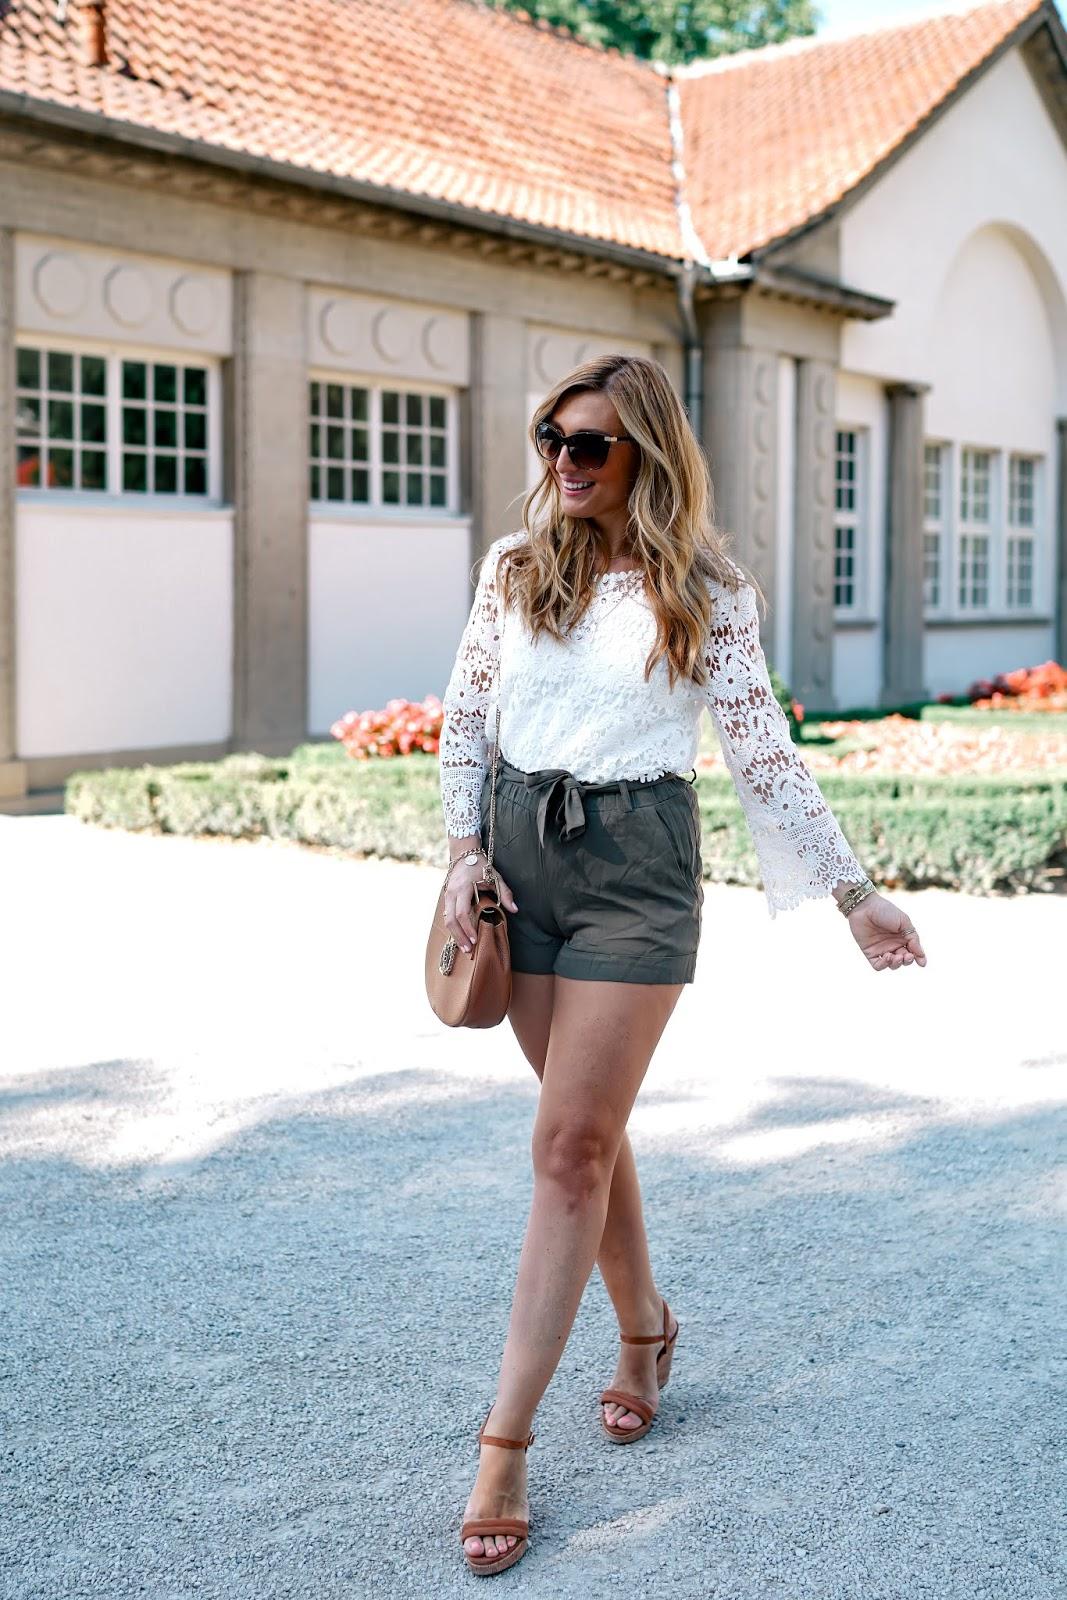 sommer-trend-boho-style-hänkeltop-richtig-kombinieren-fashionstylebyjohanna